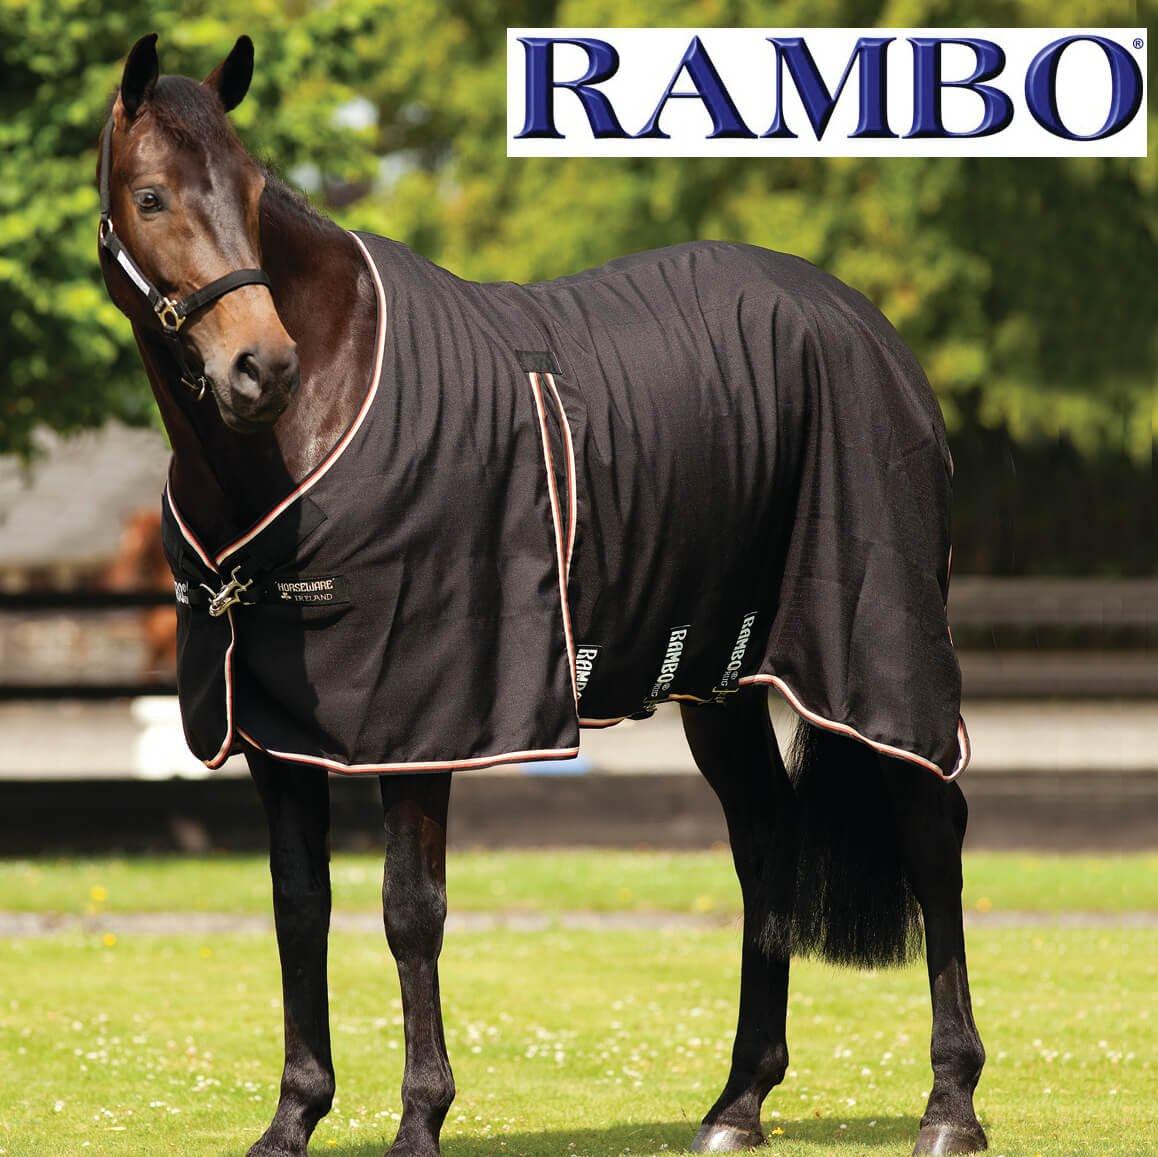 165 cm Rambo Optimo Stable Sheet Black Tan orange 87 7ft 3